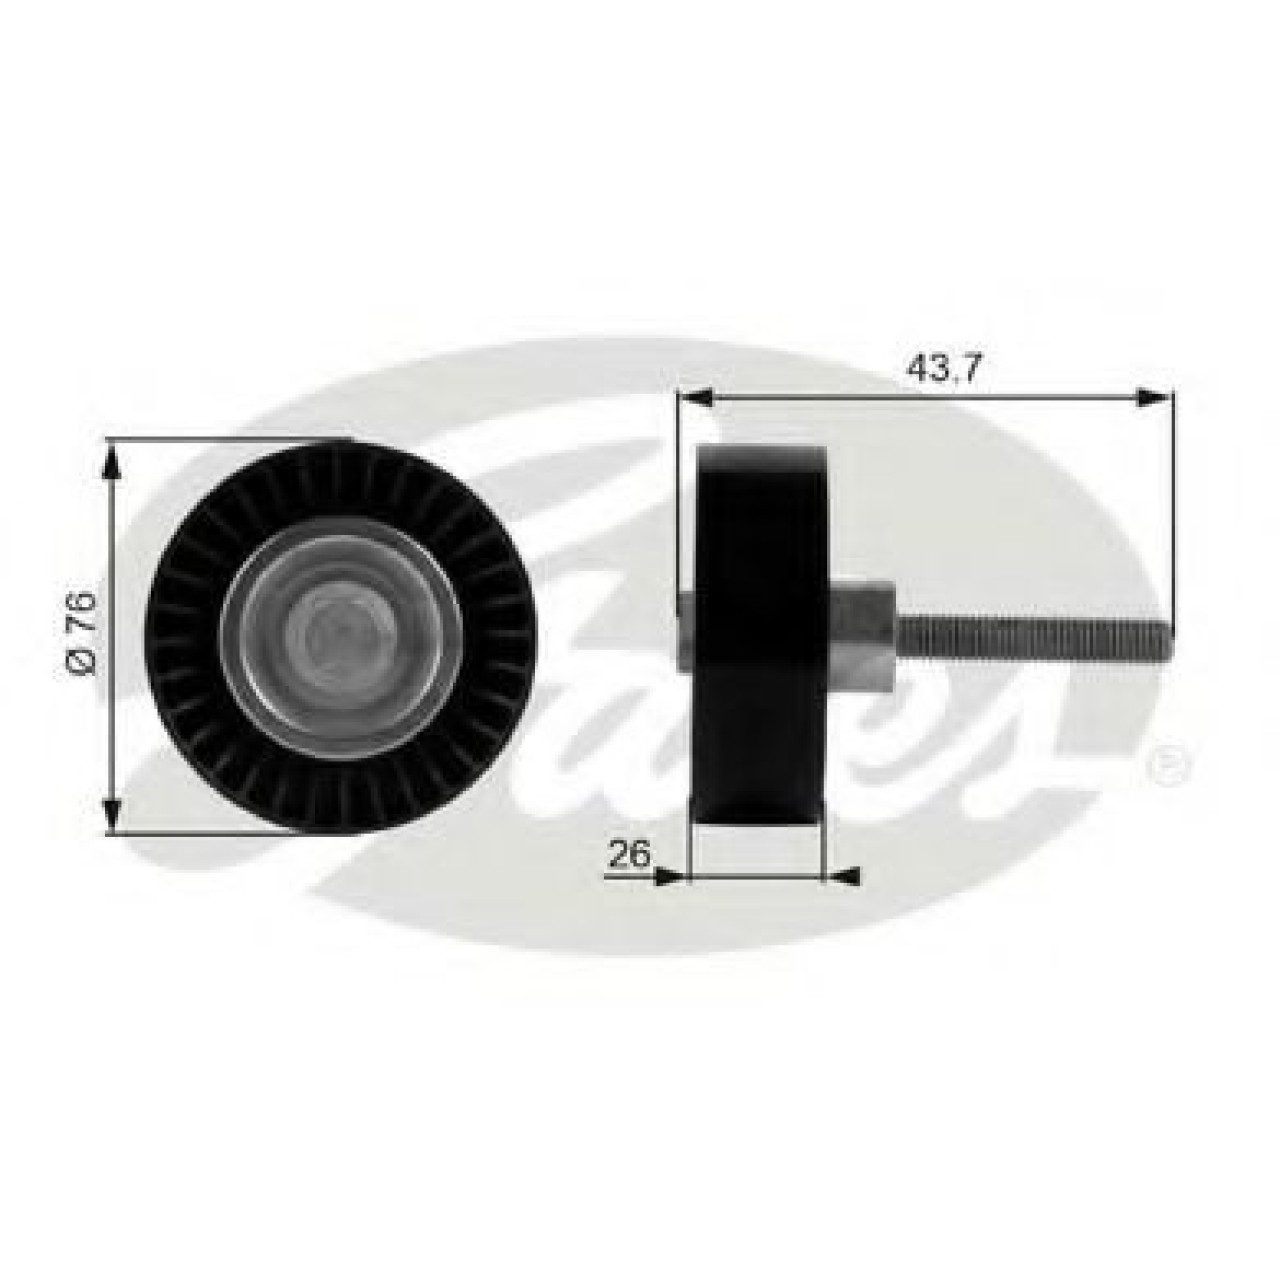 Rola ghidare/conducere, curea transmisie AUDI A1 Sportback (8XA, 8XF, 8XK) (2011 - 2016) GATES T38054 - produs NOU